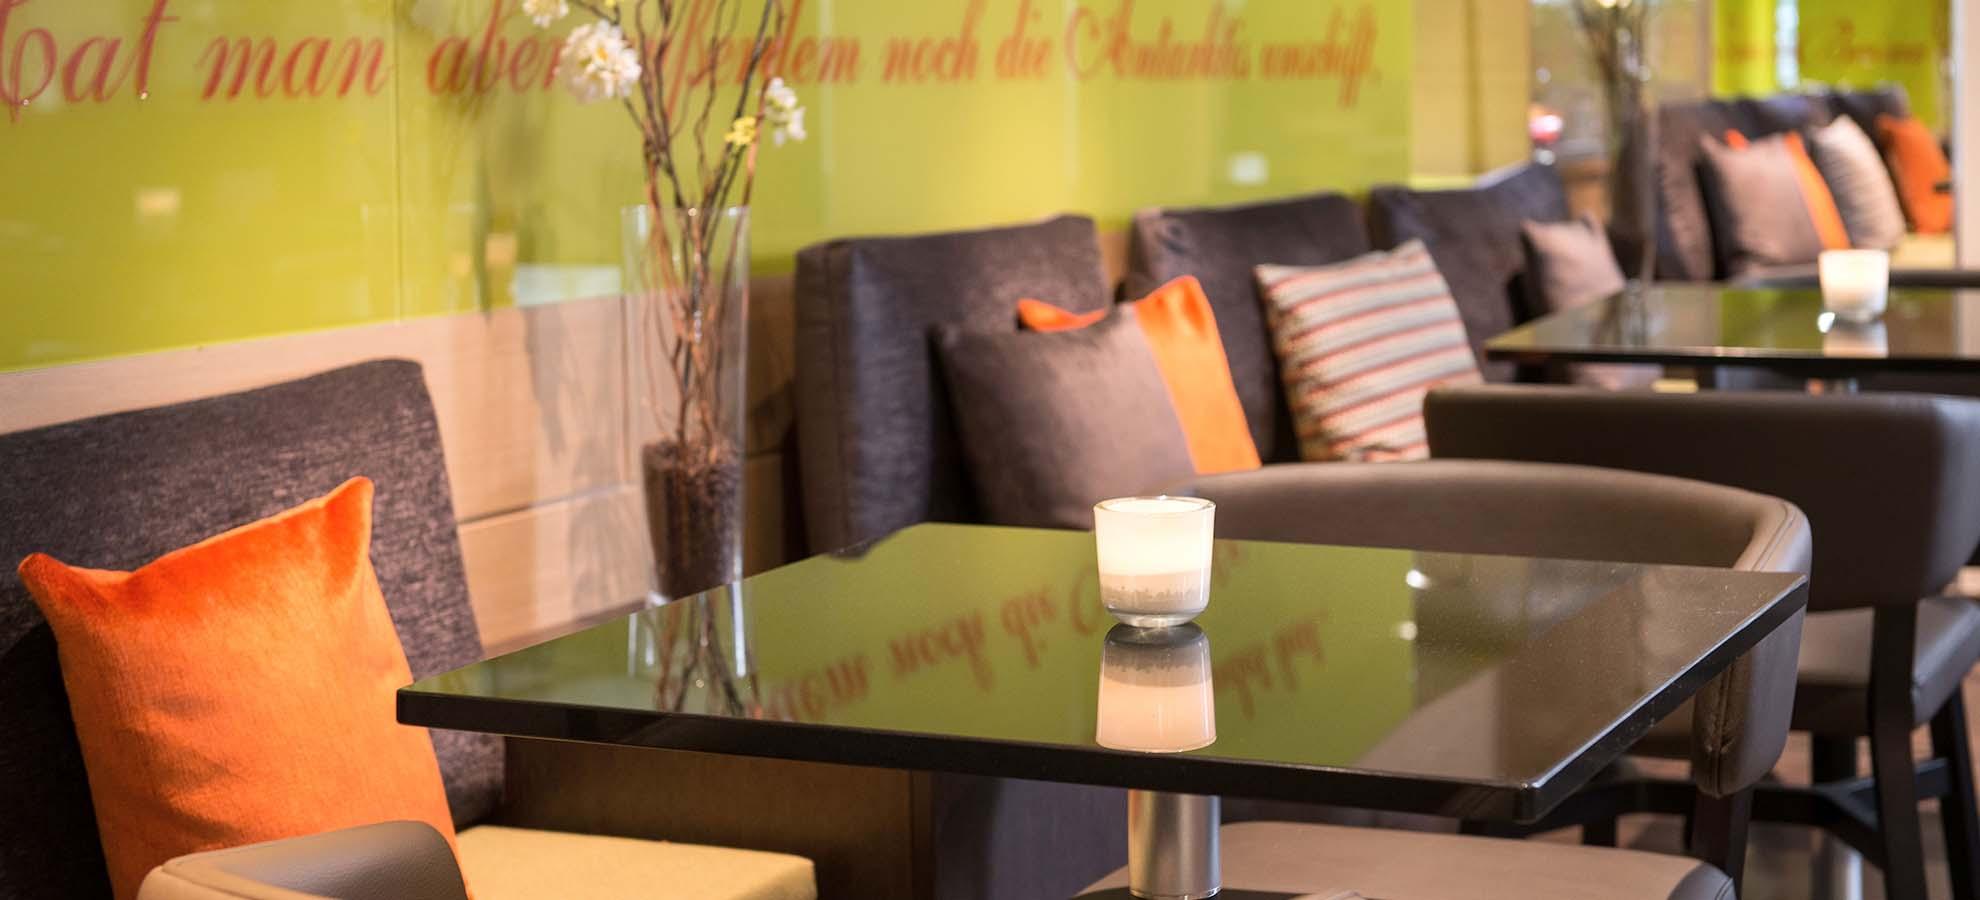 Hotel Lyskirchen Lobby Sitzecke / Lobby Sitting area